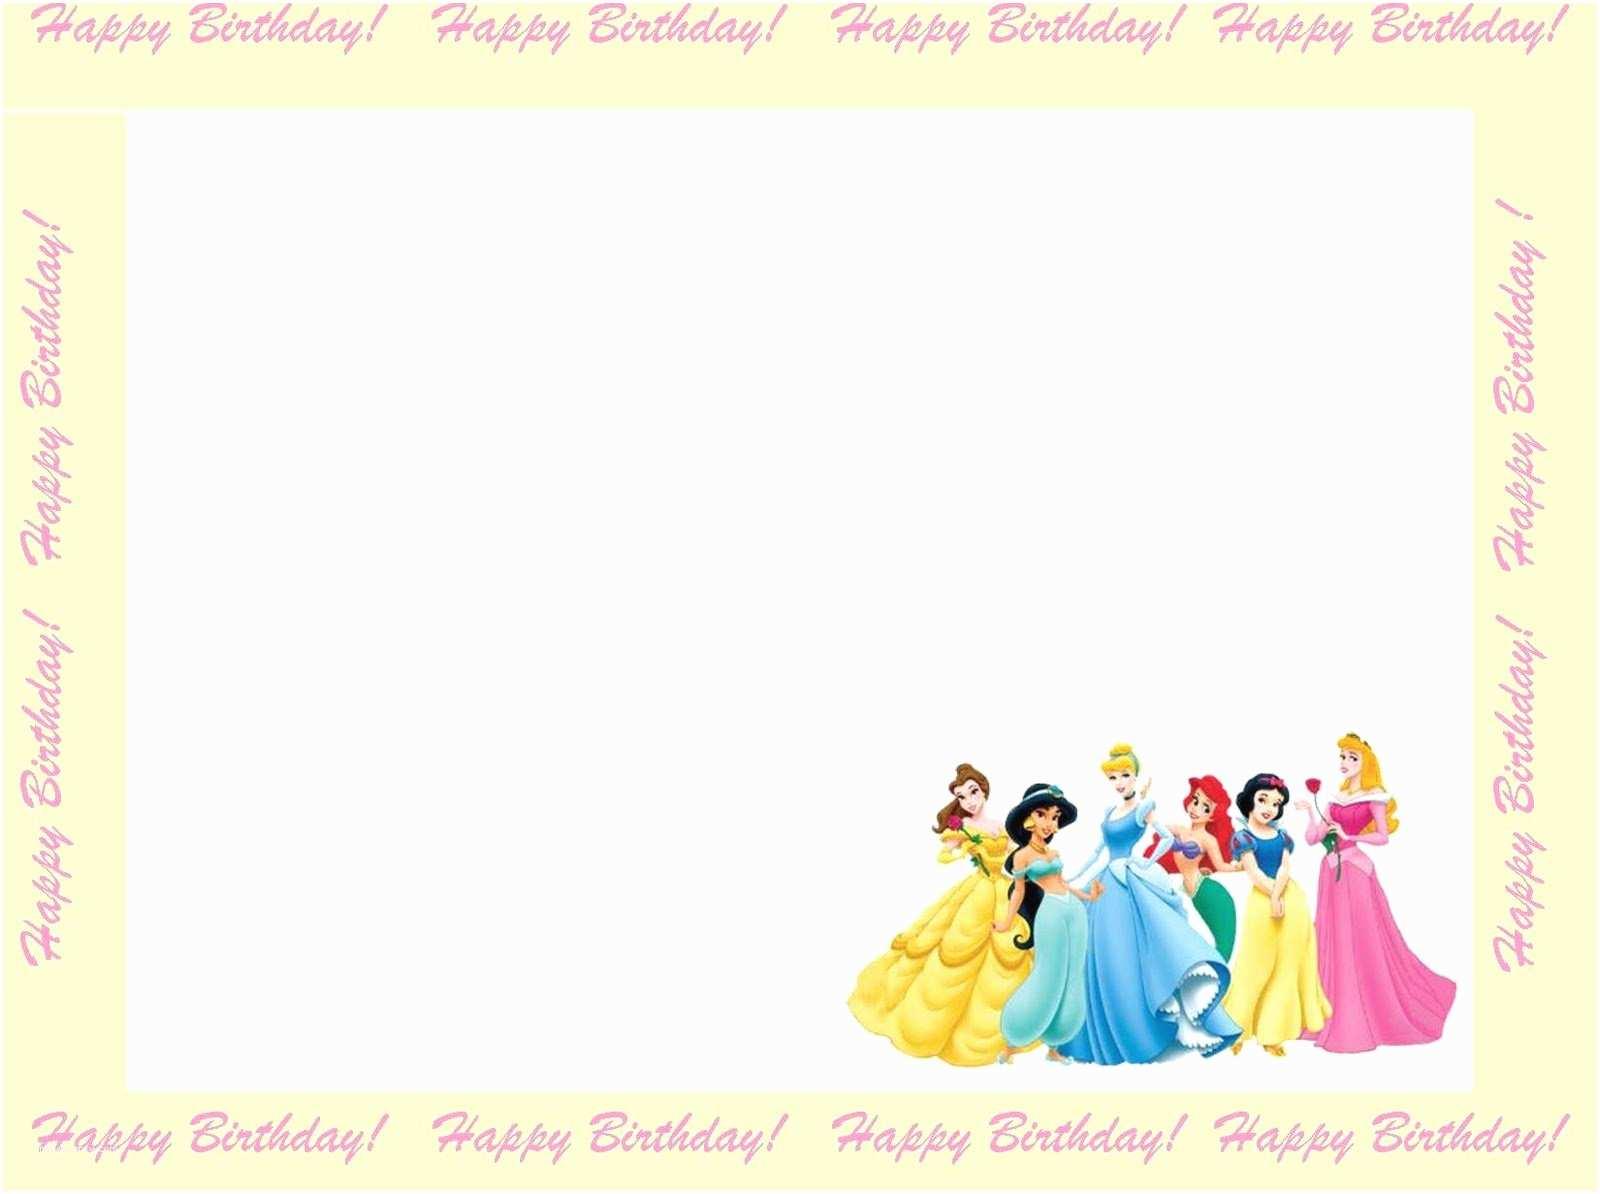 Disney Princess Birthday Invitations Disney Princesses Birthday Invitations Disney Princess